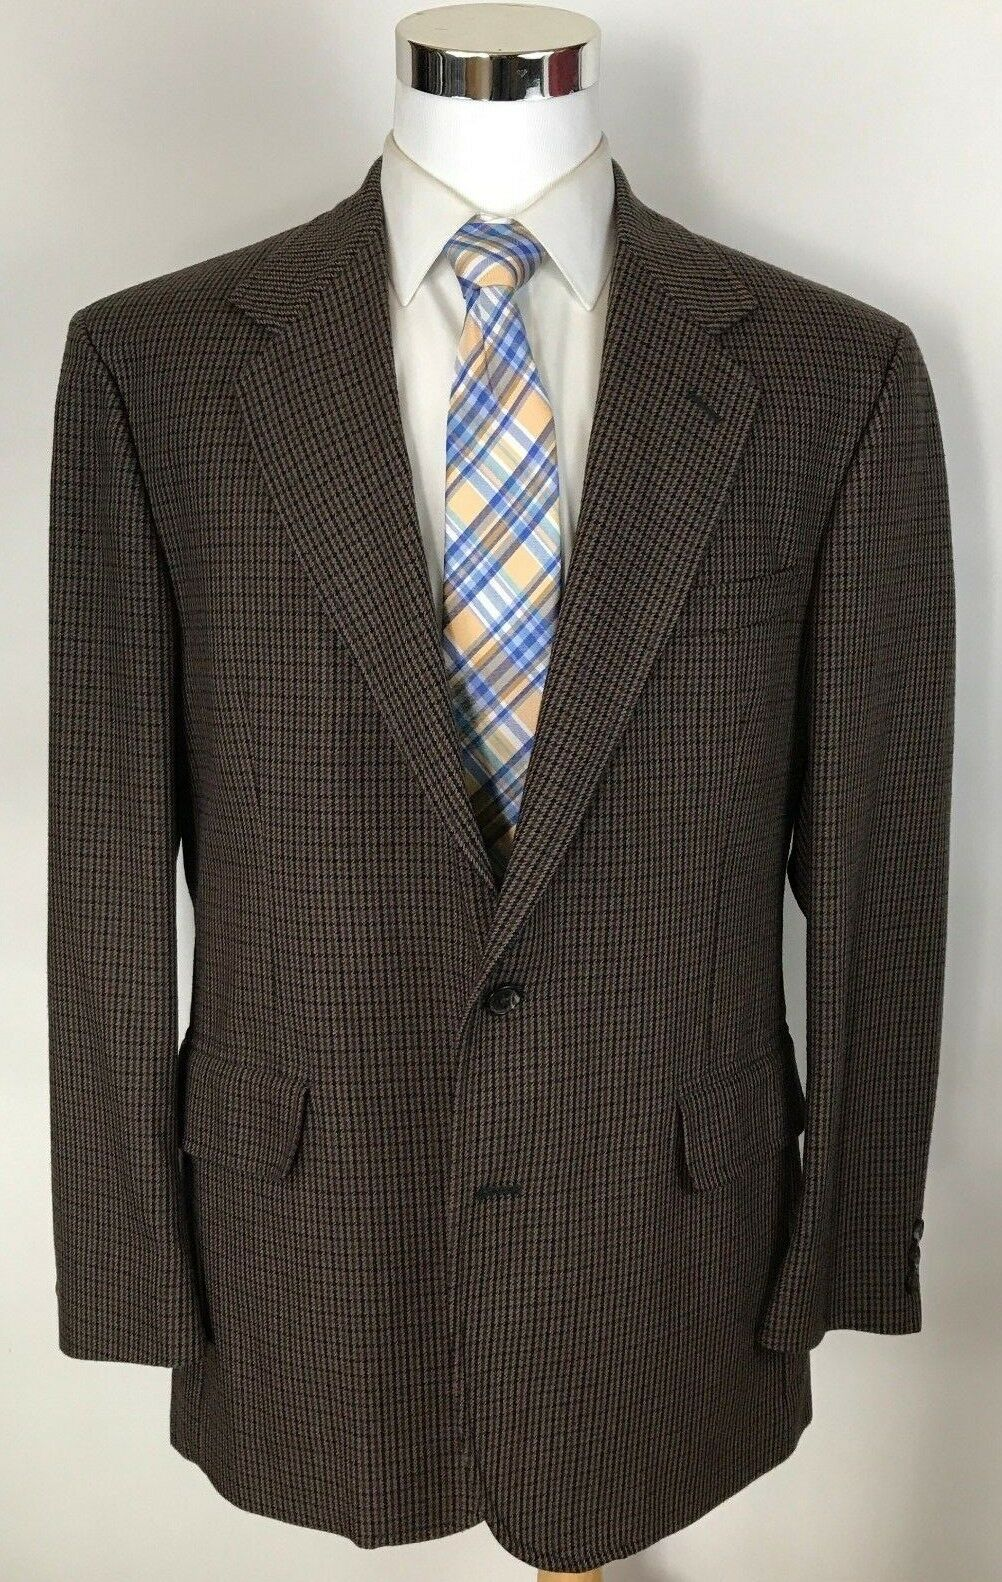 Pendleton Classic Braun Multi-Farbe Houndstooth Country Blazer Sport Coat 44L